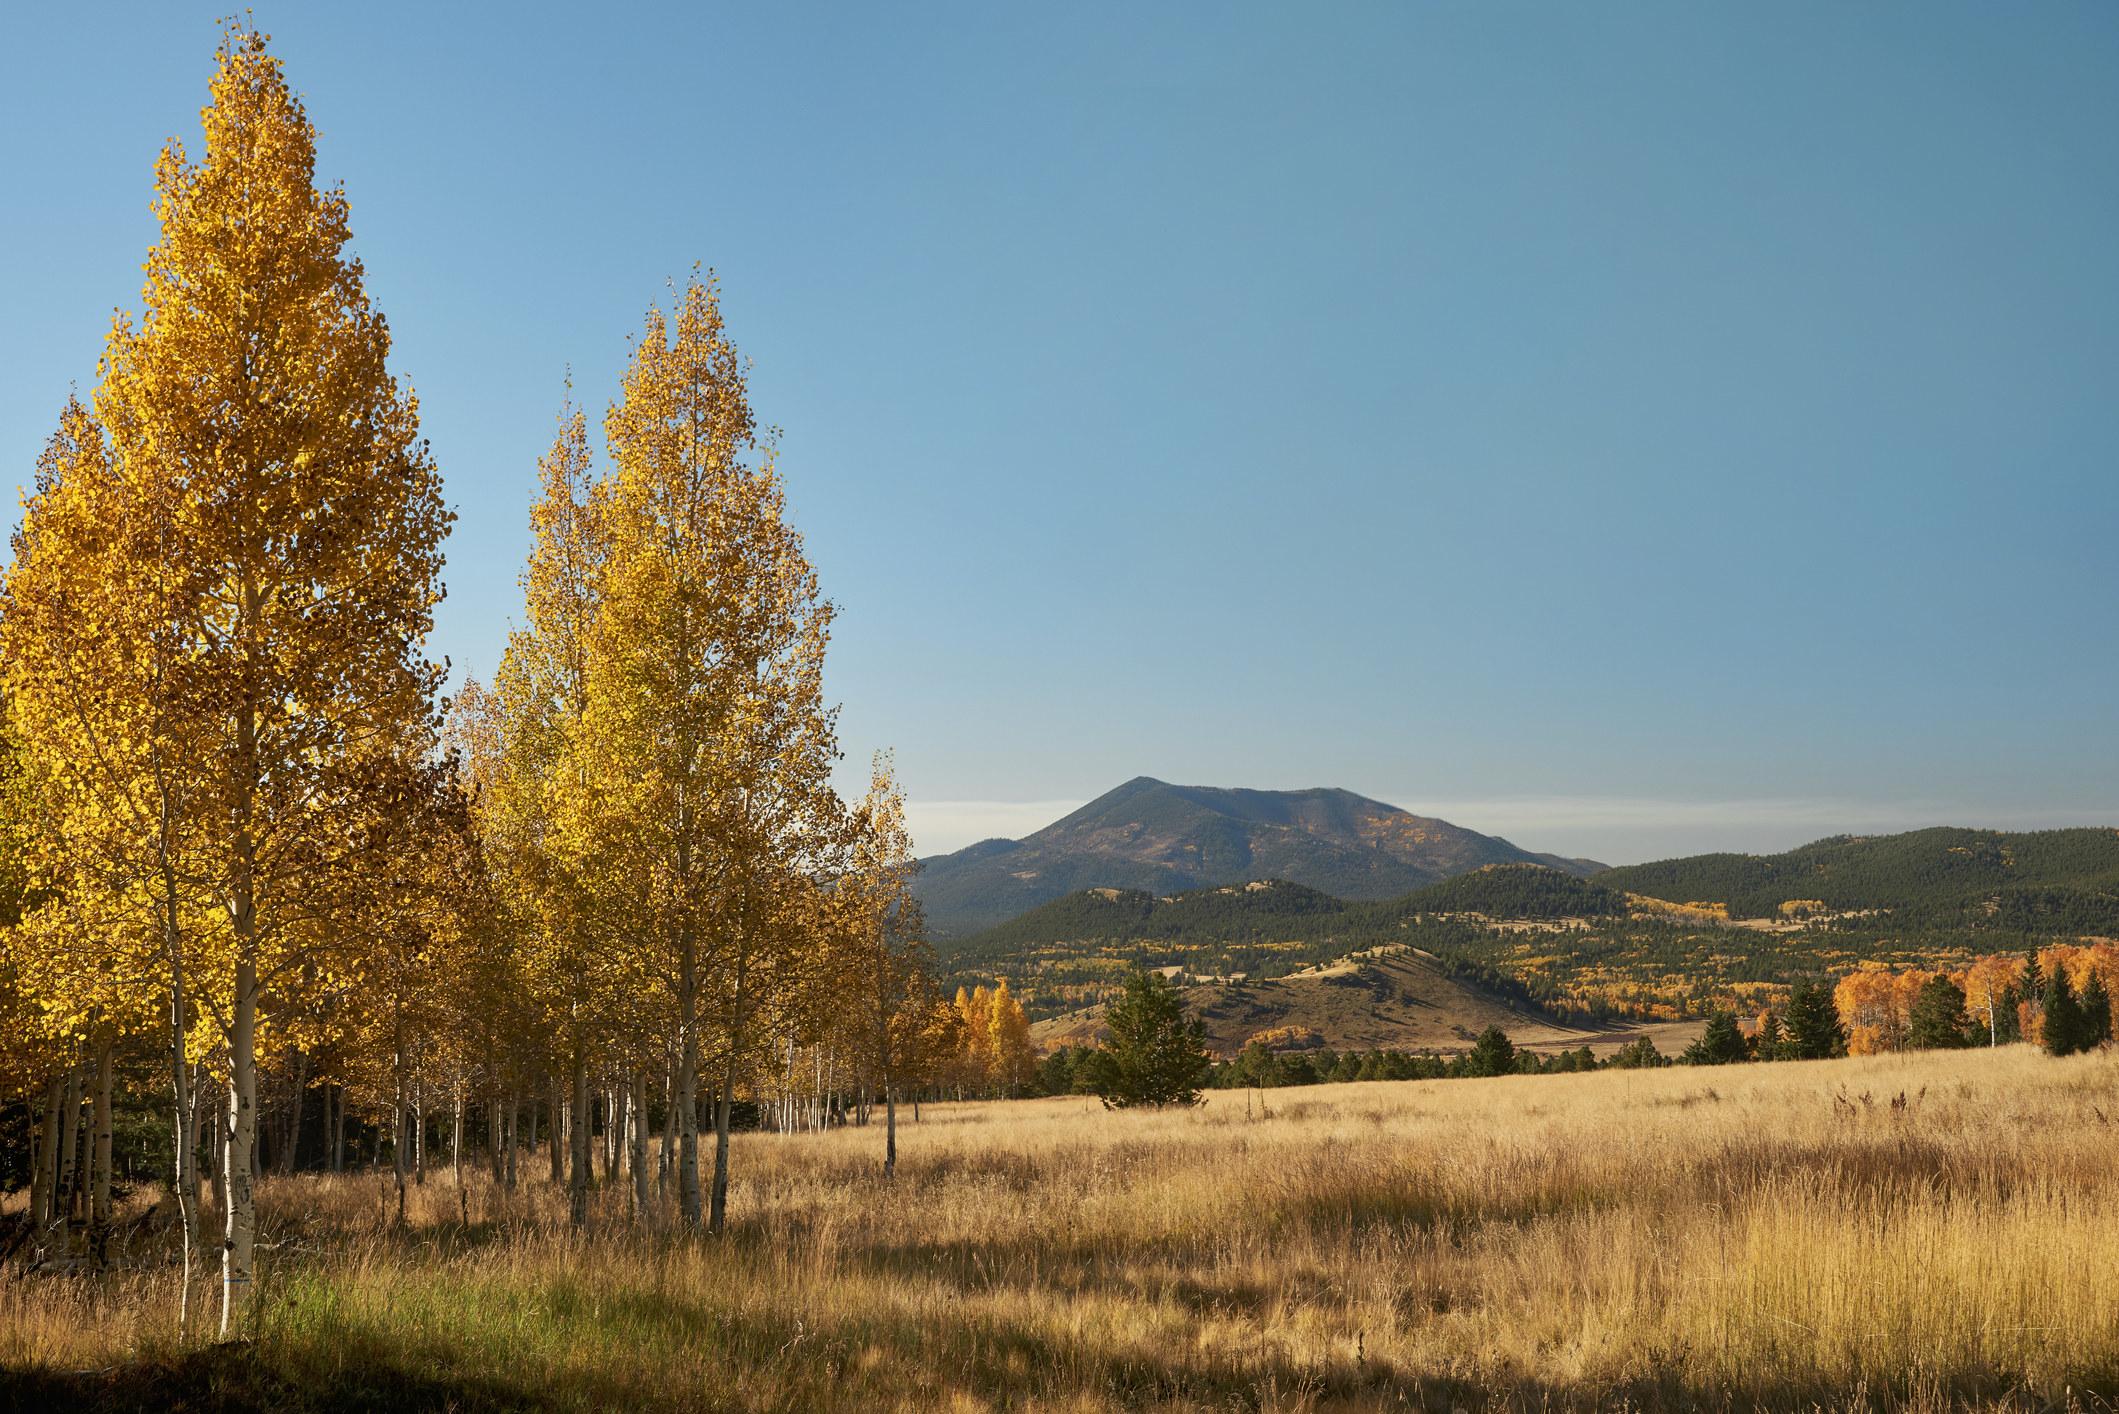 Flagstaff Arizona mountains and aspen trees